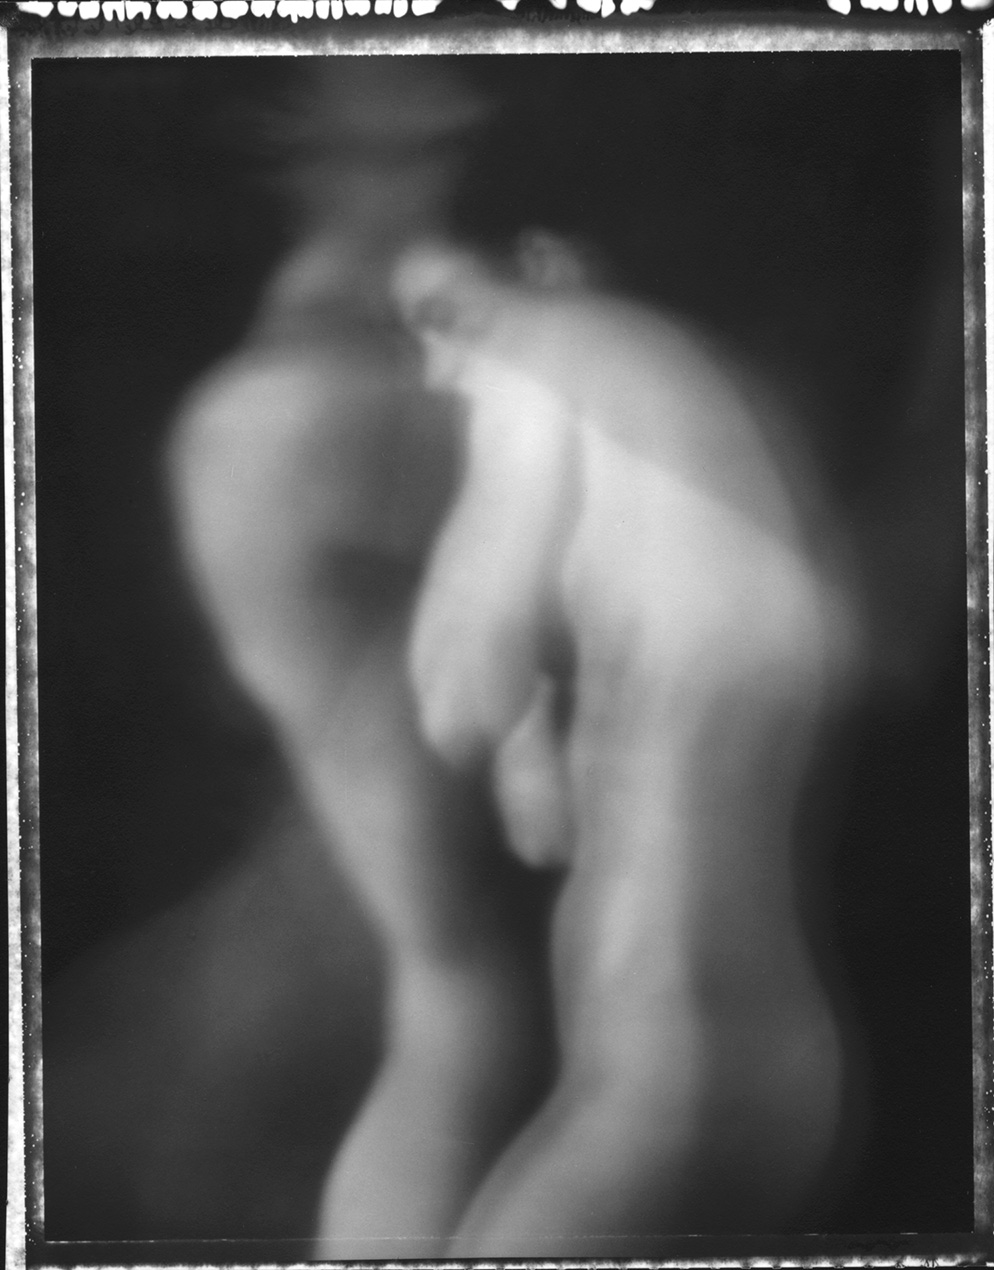 Self-Portrait #3B, 2001